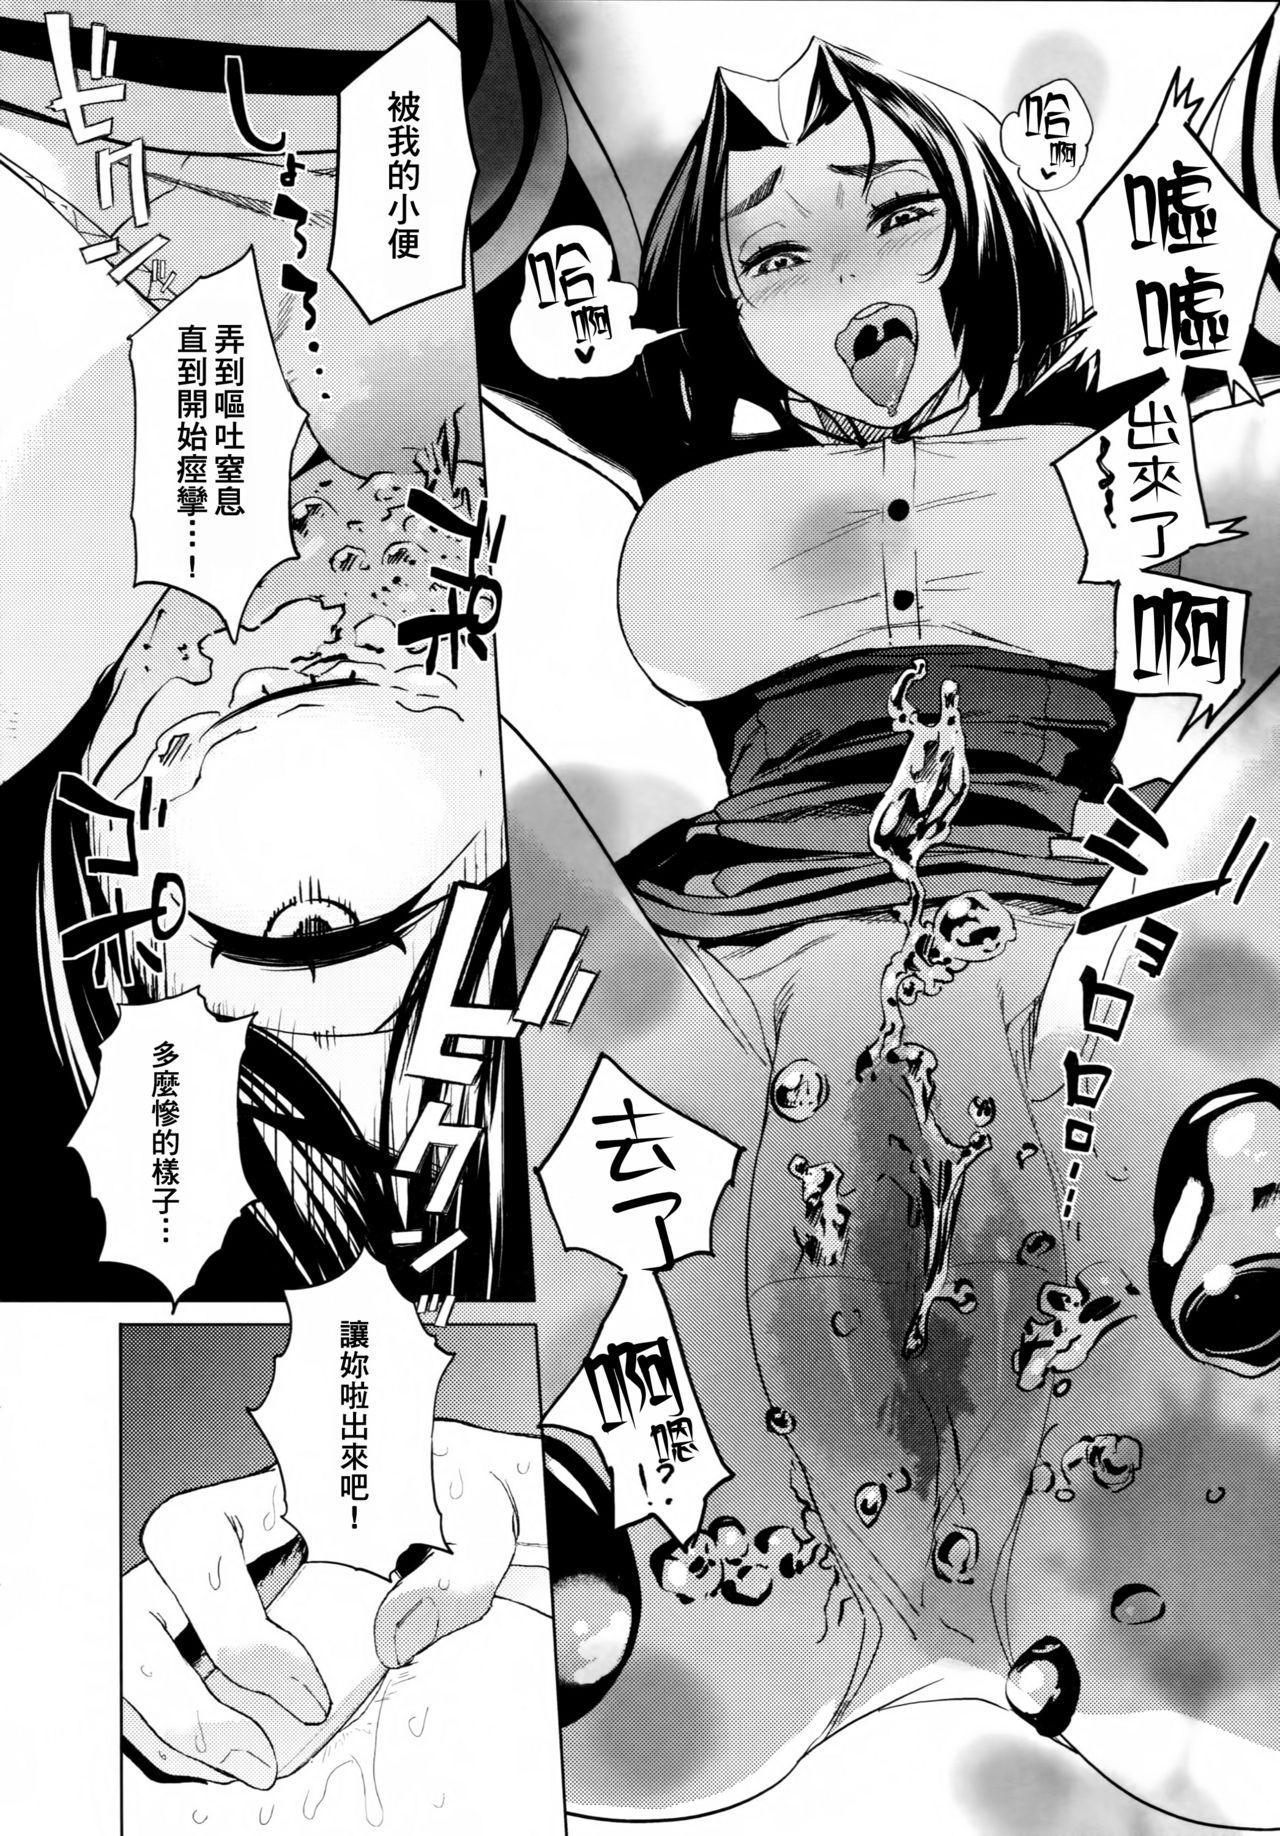 KanColle Haisetsu Sex Goudoushi LoveSca! Goudou Enshuu!! | 艦C排泄性交合同誌 激情糞便! 聯合演習!! 81